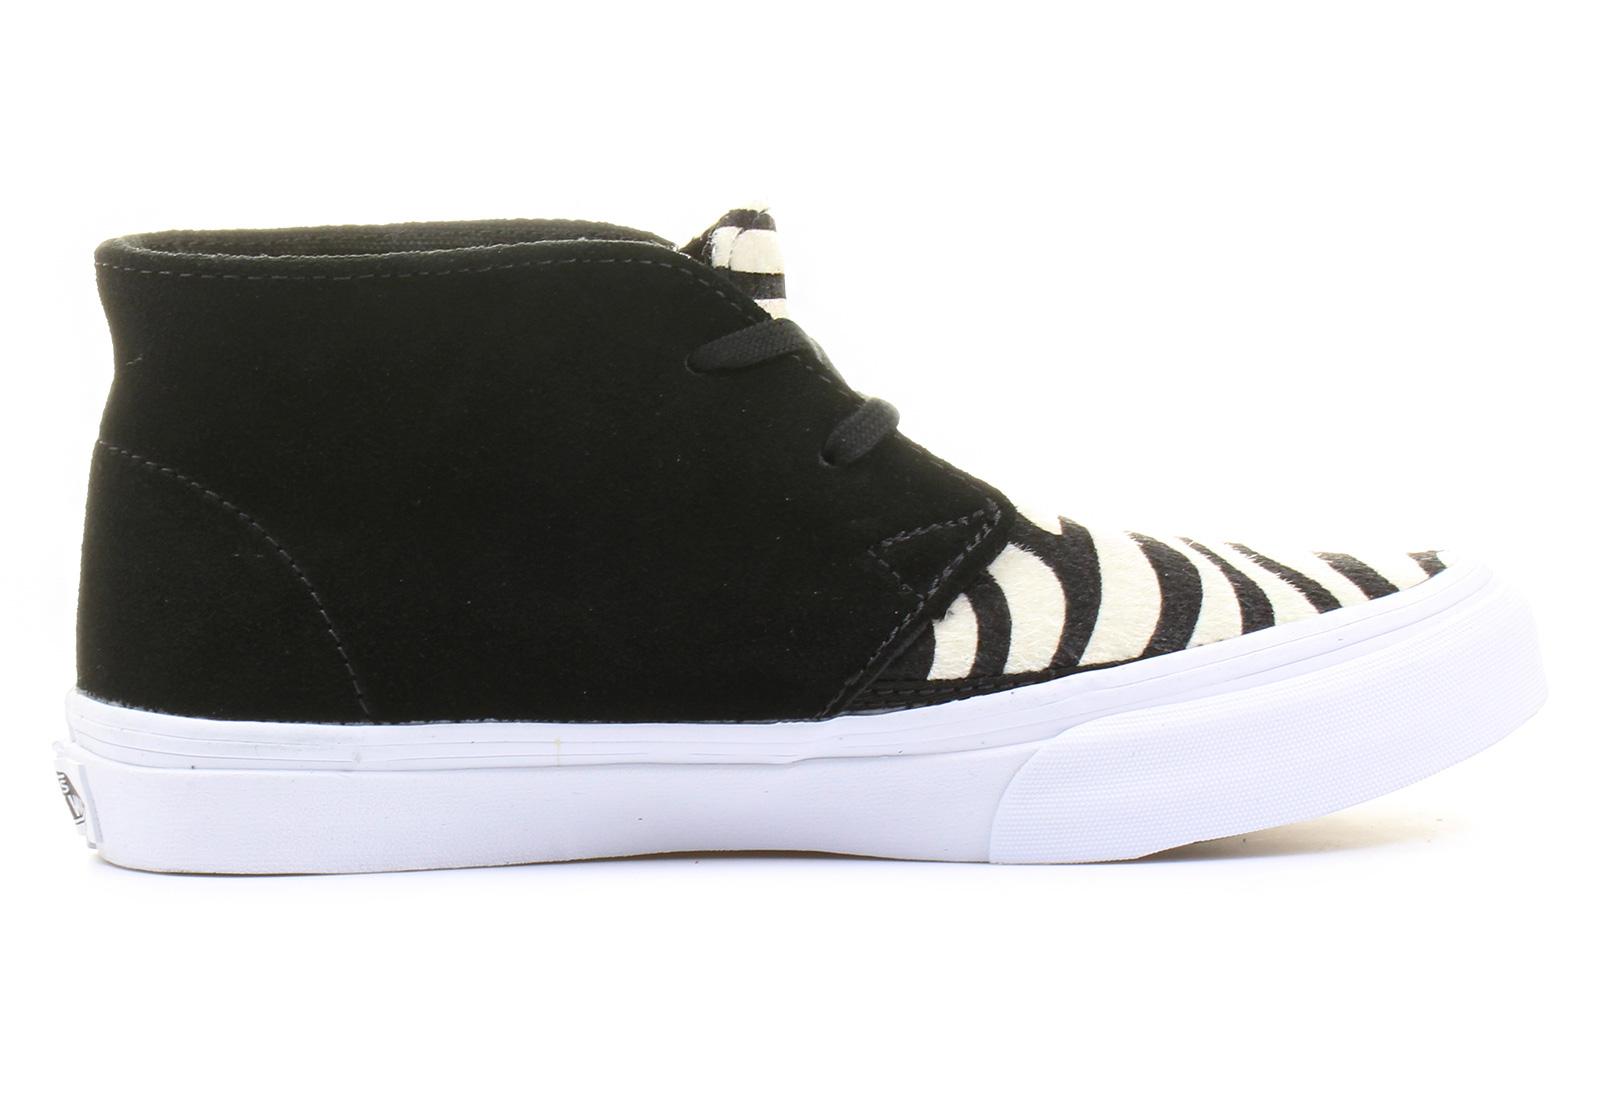 Vans Cipő - Chukka Slim - vqfa8u7 - Office Shoes Magyarország 49aa49cacd